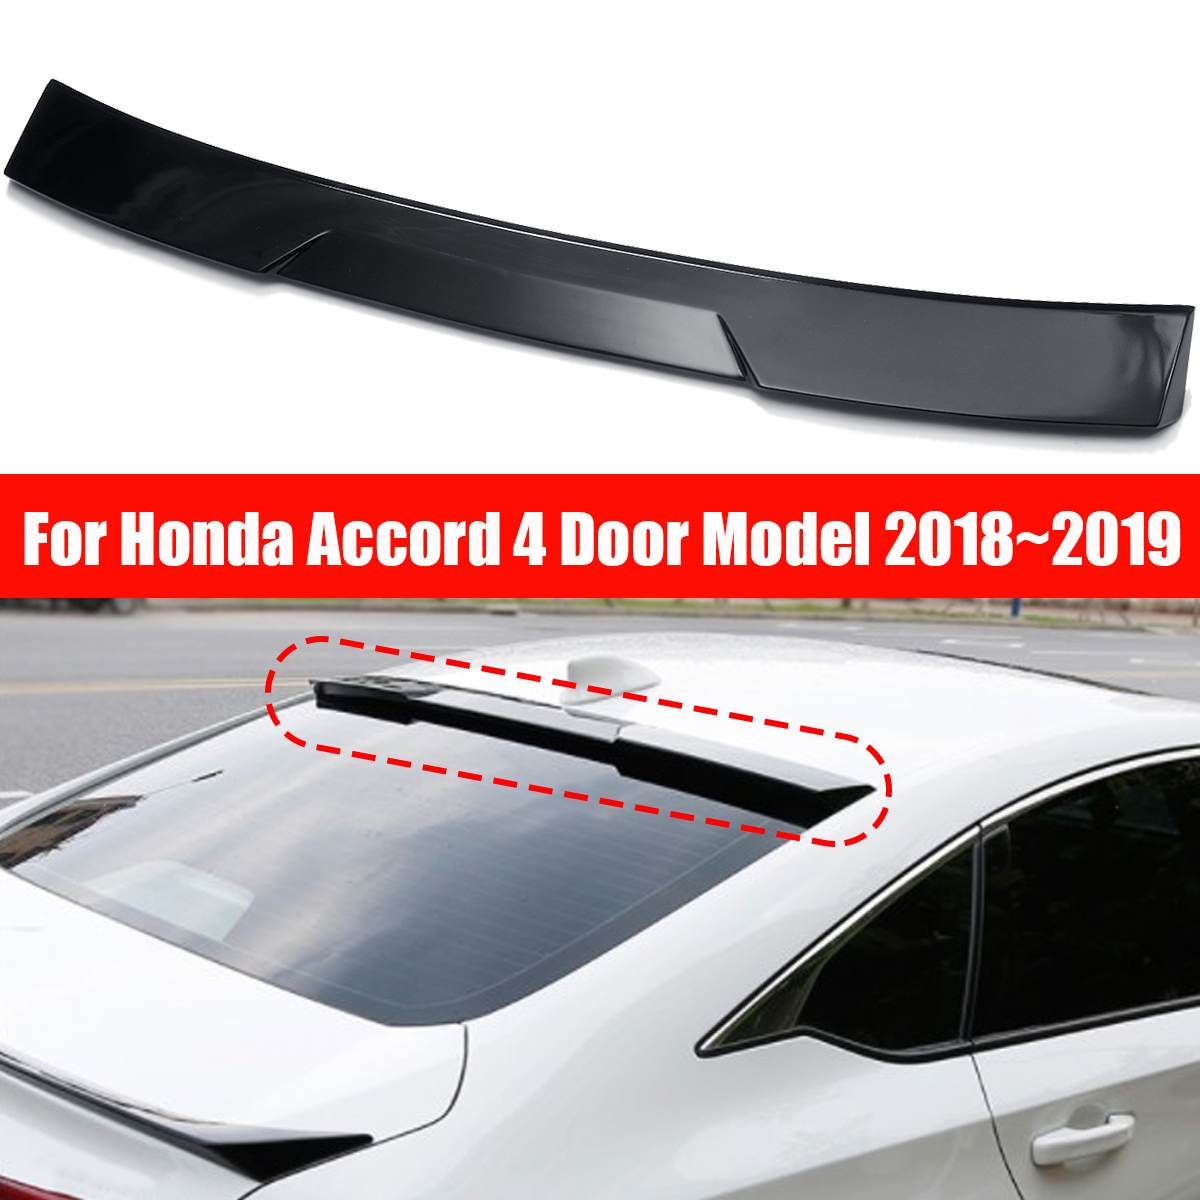 ABS Rear Window Visor Gloss Black Roof Spoiler for HONDA for ACCORD 10th Gen Sedan VIP 2018 2019 Car  Exterior Parts